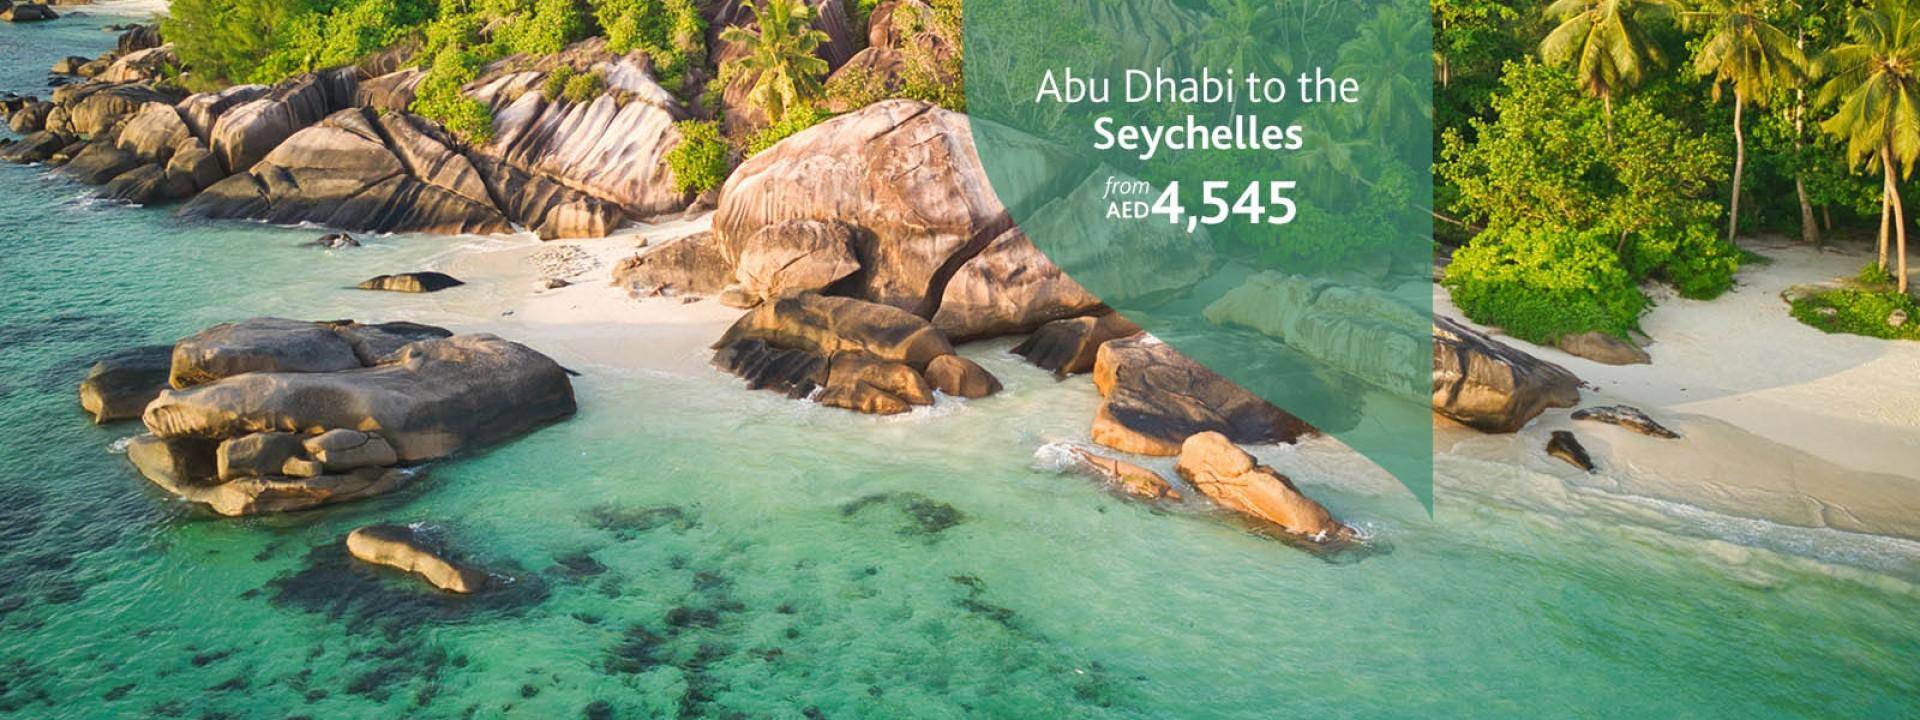 flights-from-abu-dhabi-to-mahe-seychelles-economy